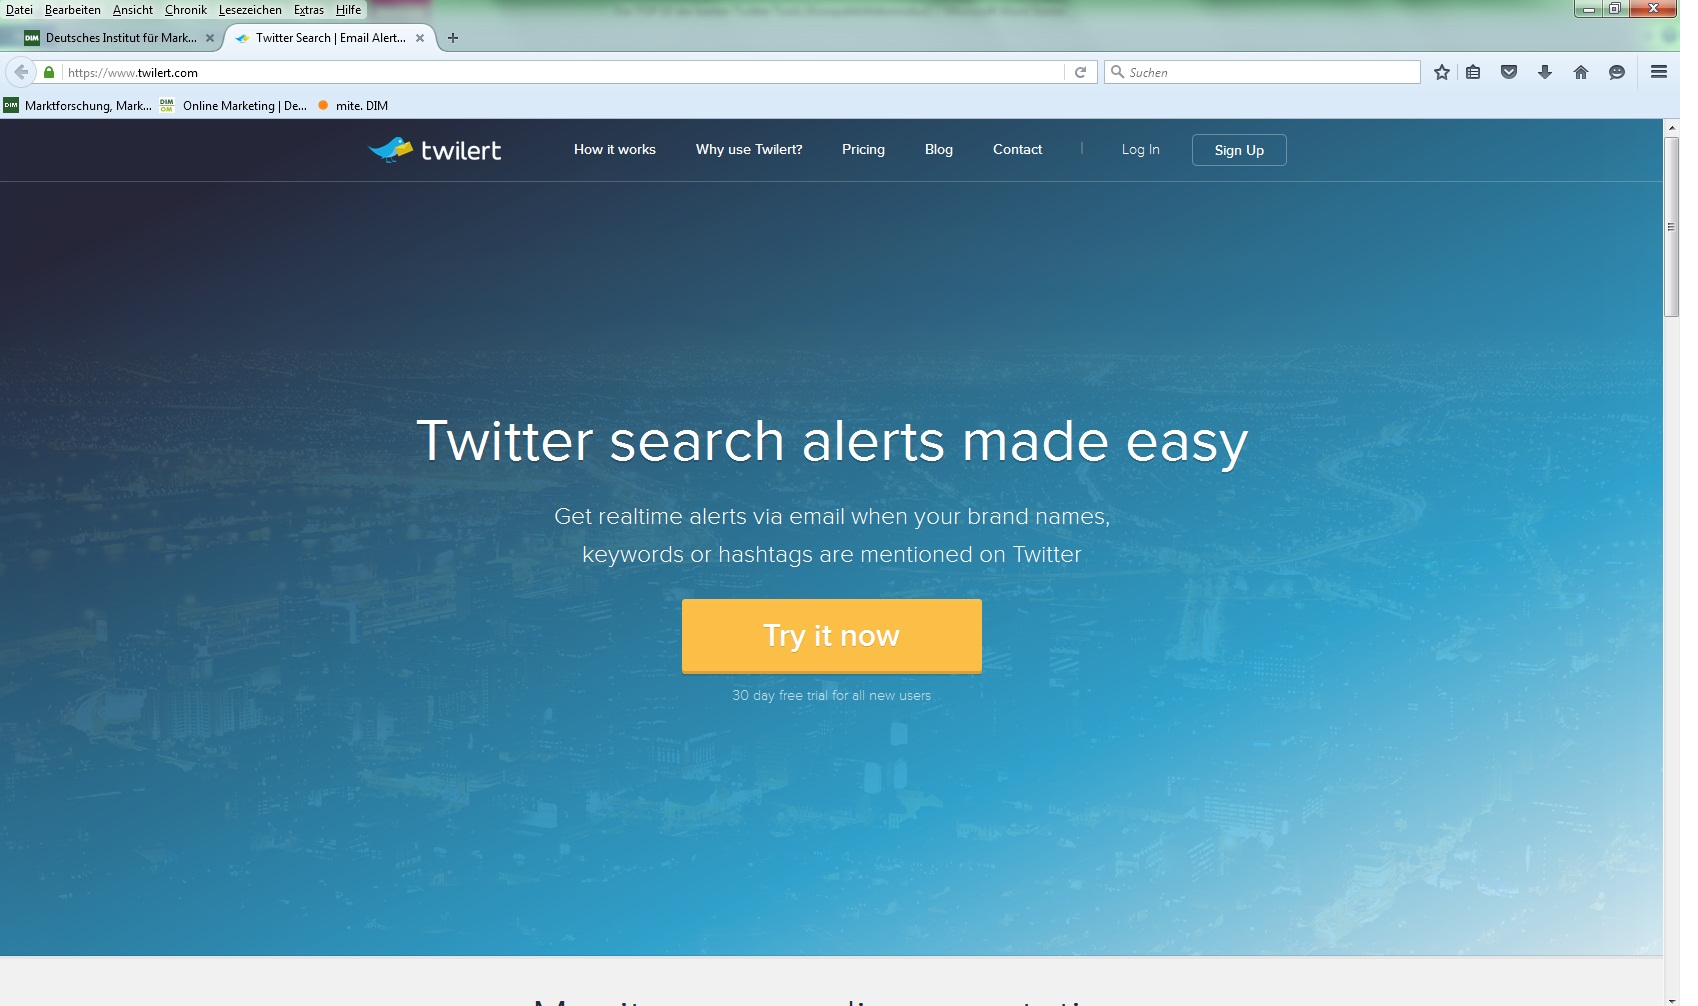 Twilert Twitter Tools